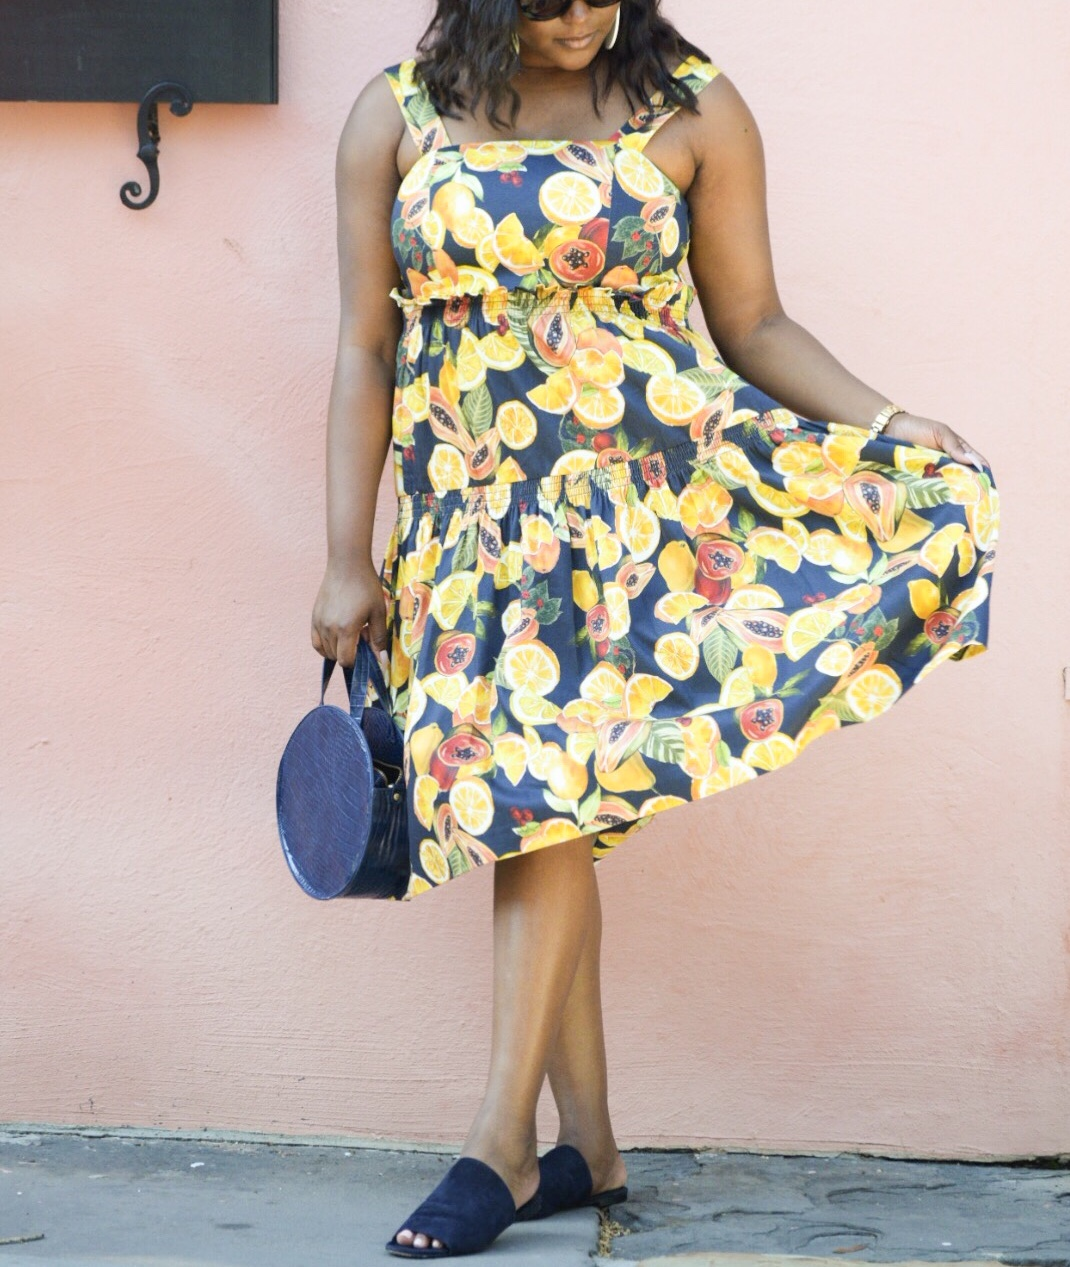 Gianni Bini Fruit  Dress , Honey B Gold Lemon  Earrings , Via Spiga  Sandals , Anthropologie Handbag (currently on sale...check your local store)